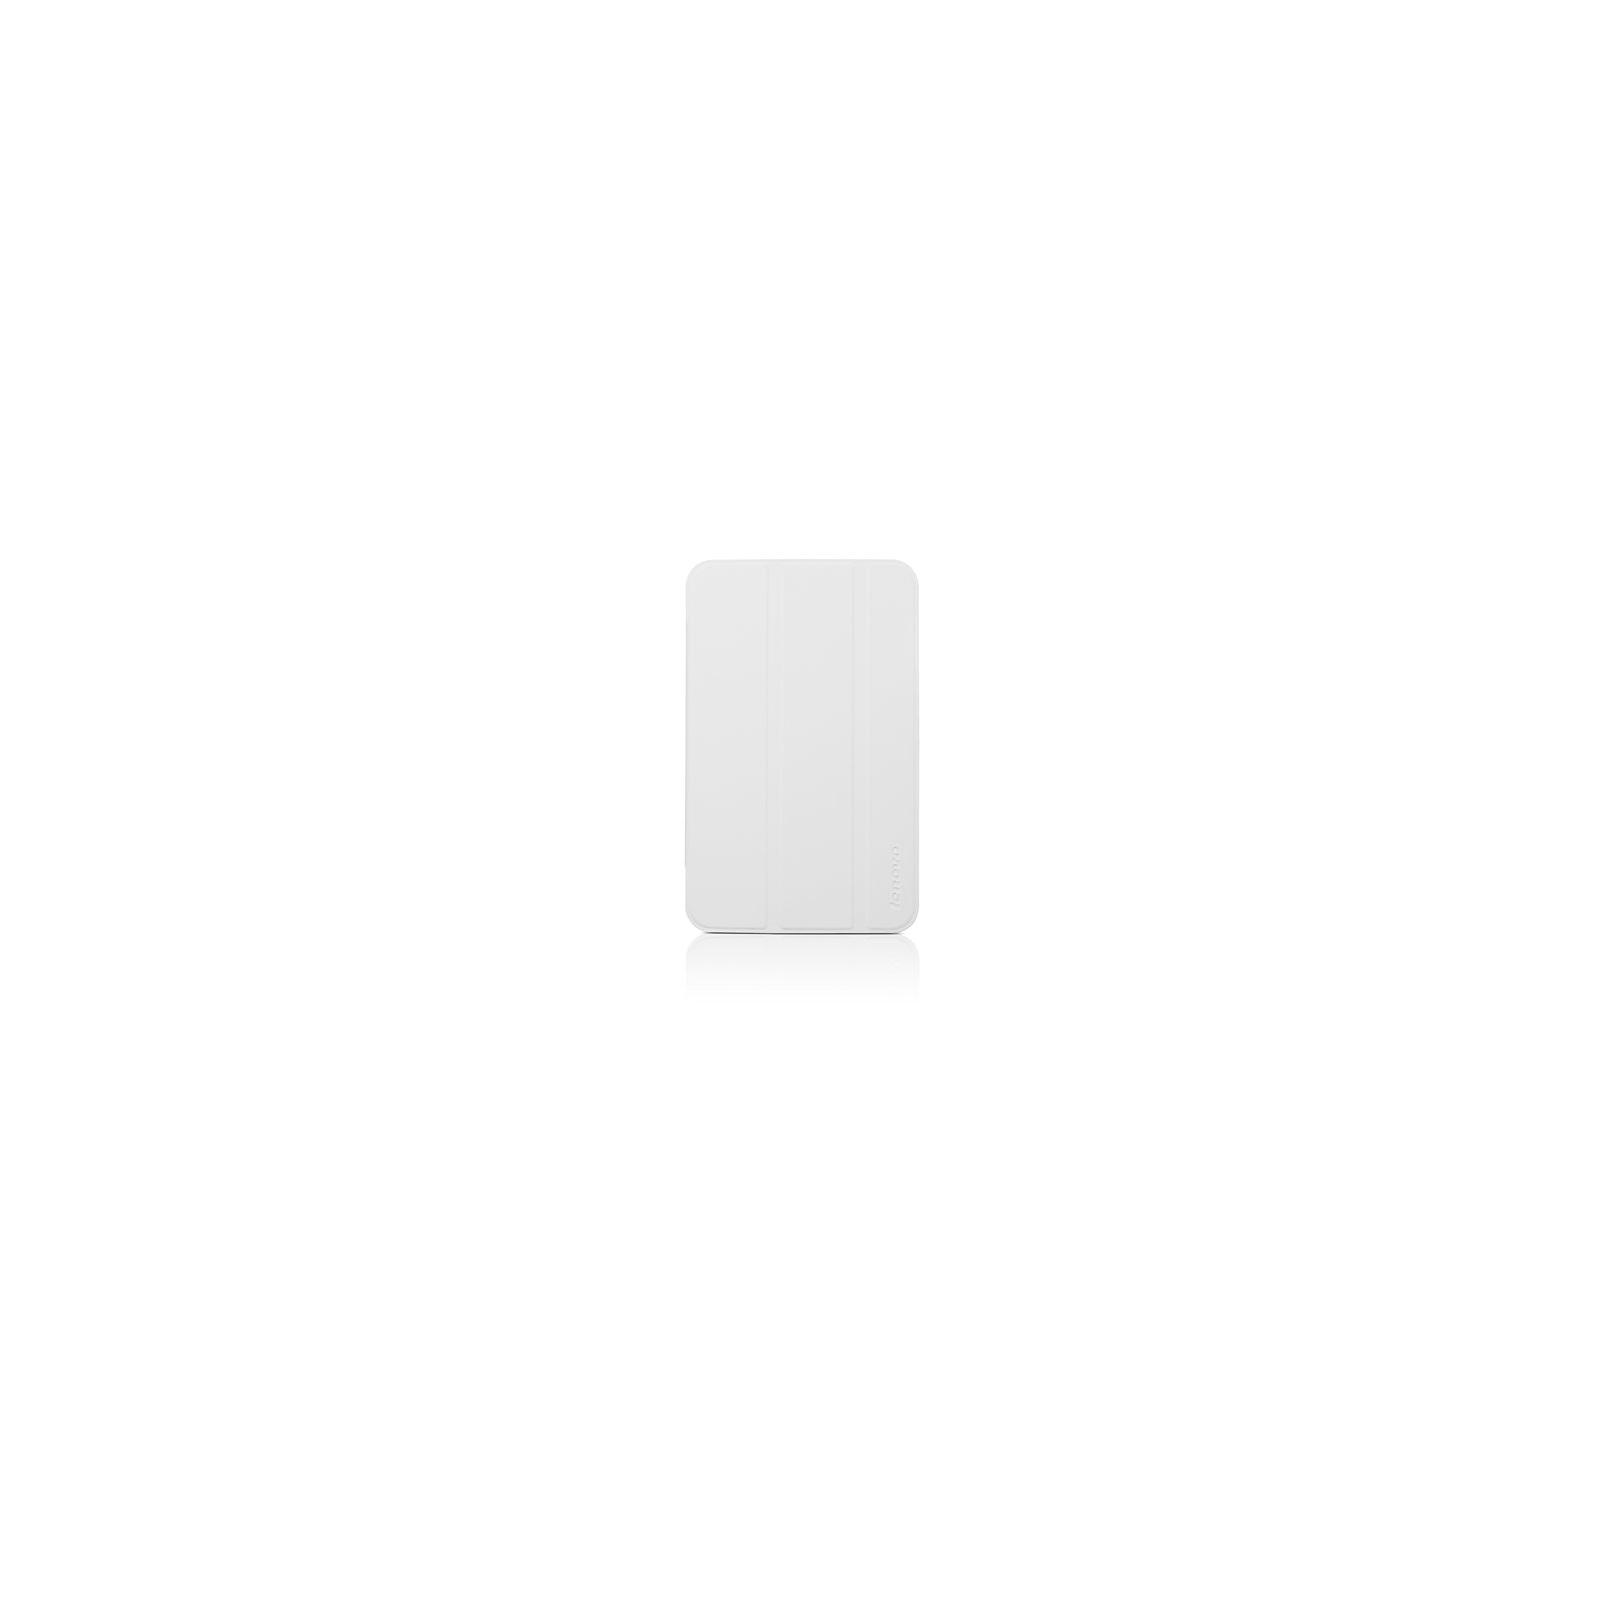 Чехол для планшета Lenovo 7 A1000 Case and film White (888015421)